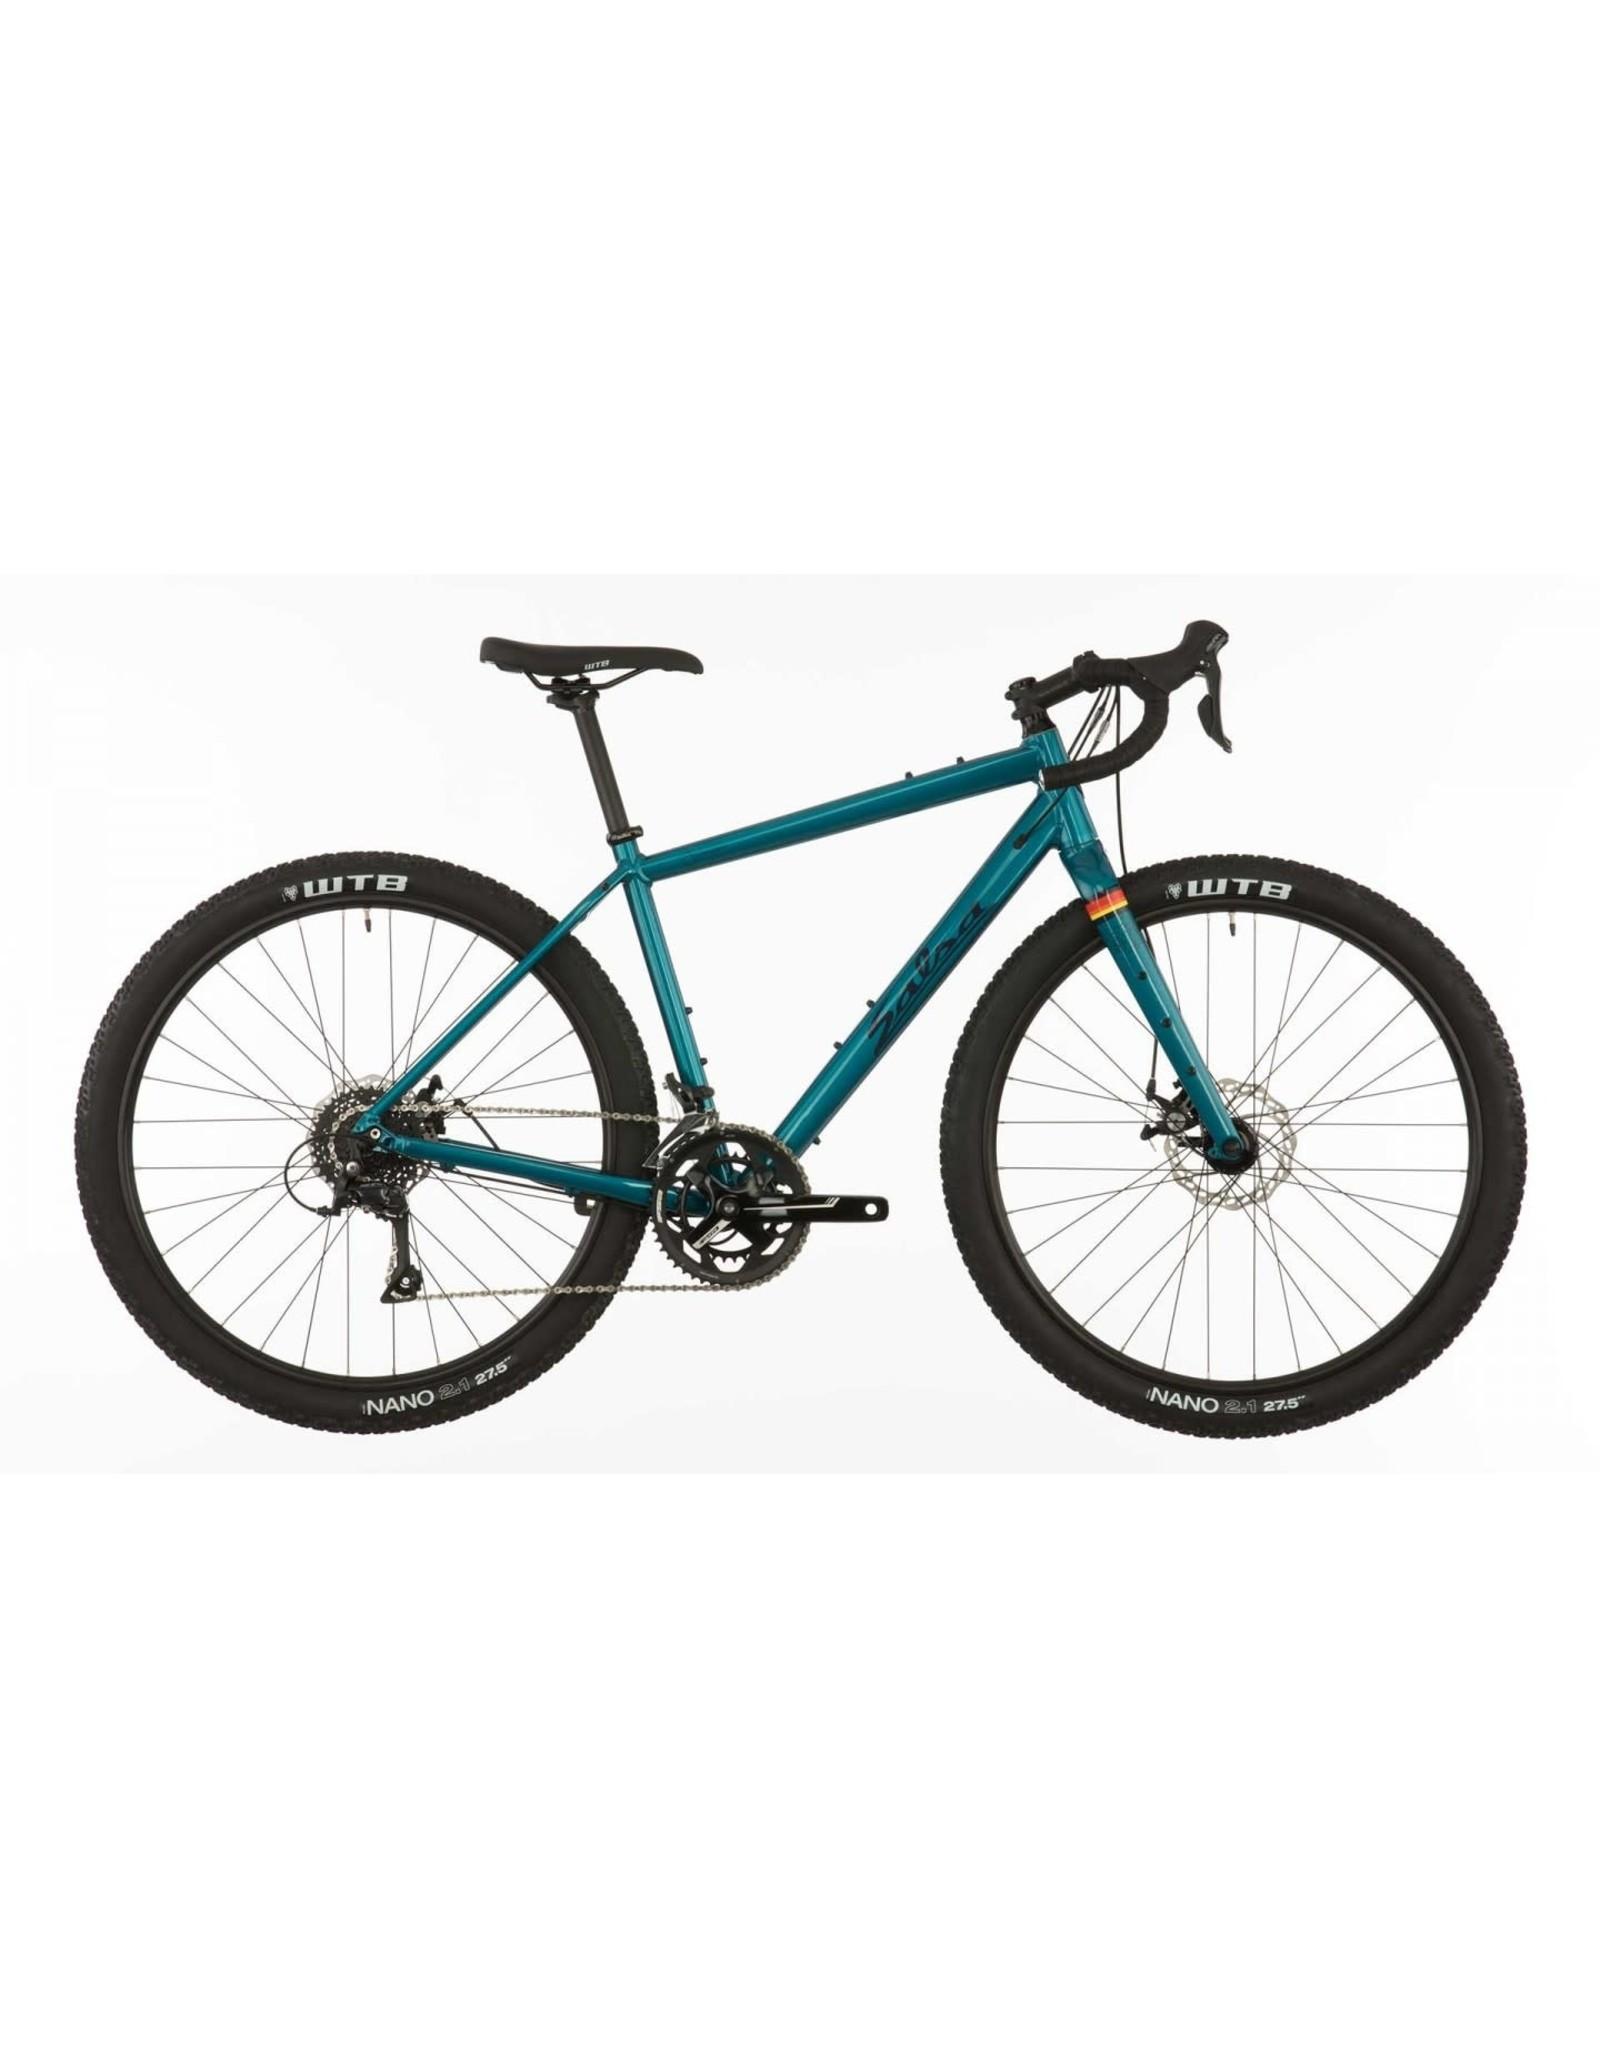 Salsa 2020 Journeyman 650b Sora Bike